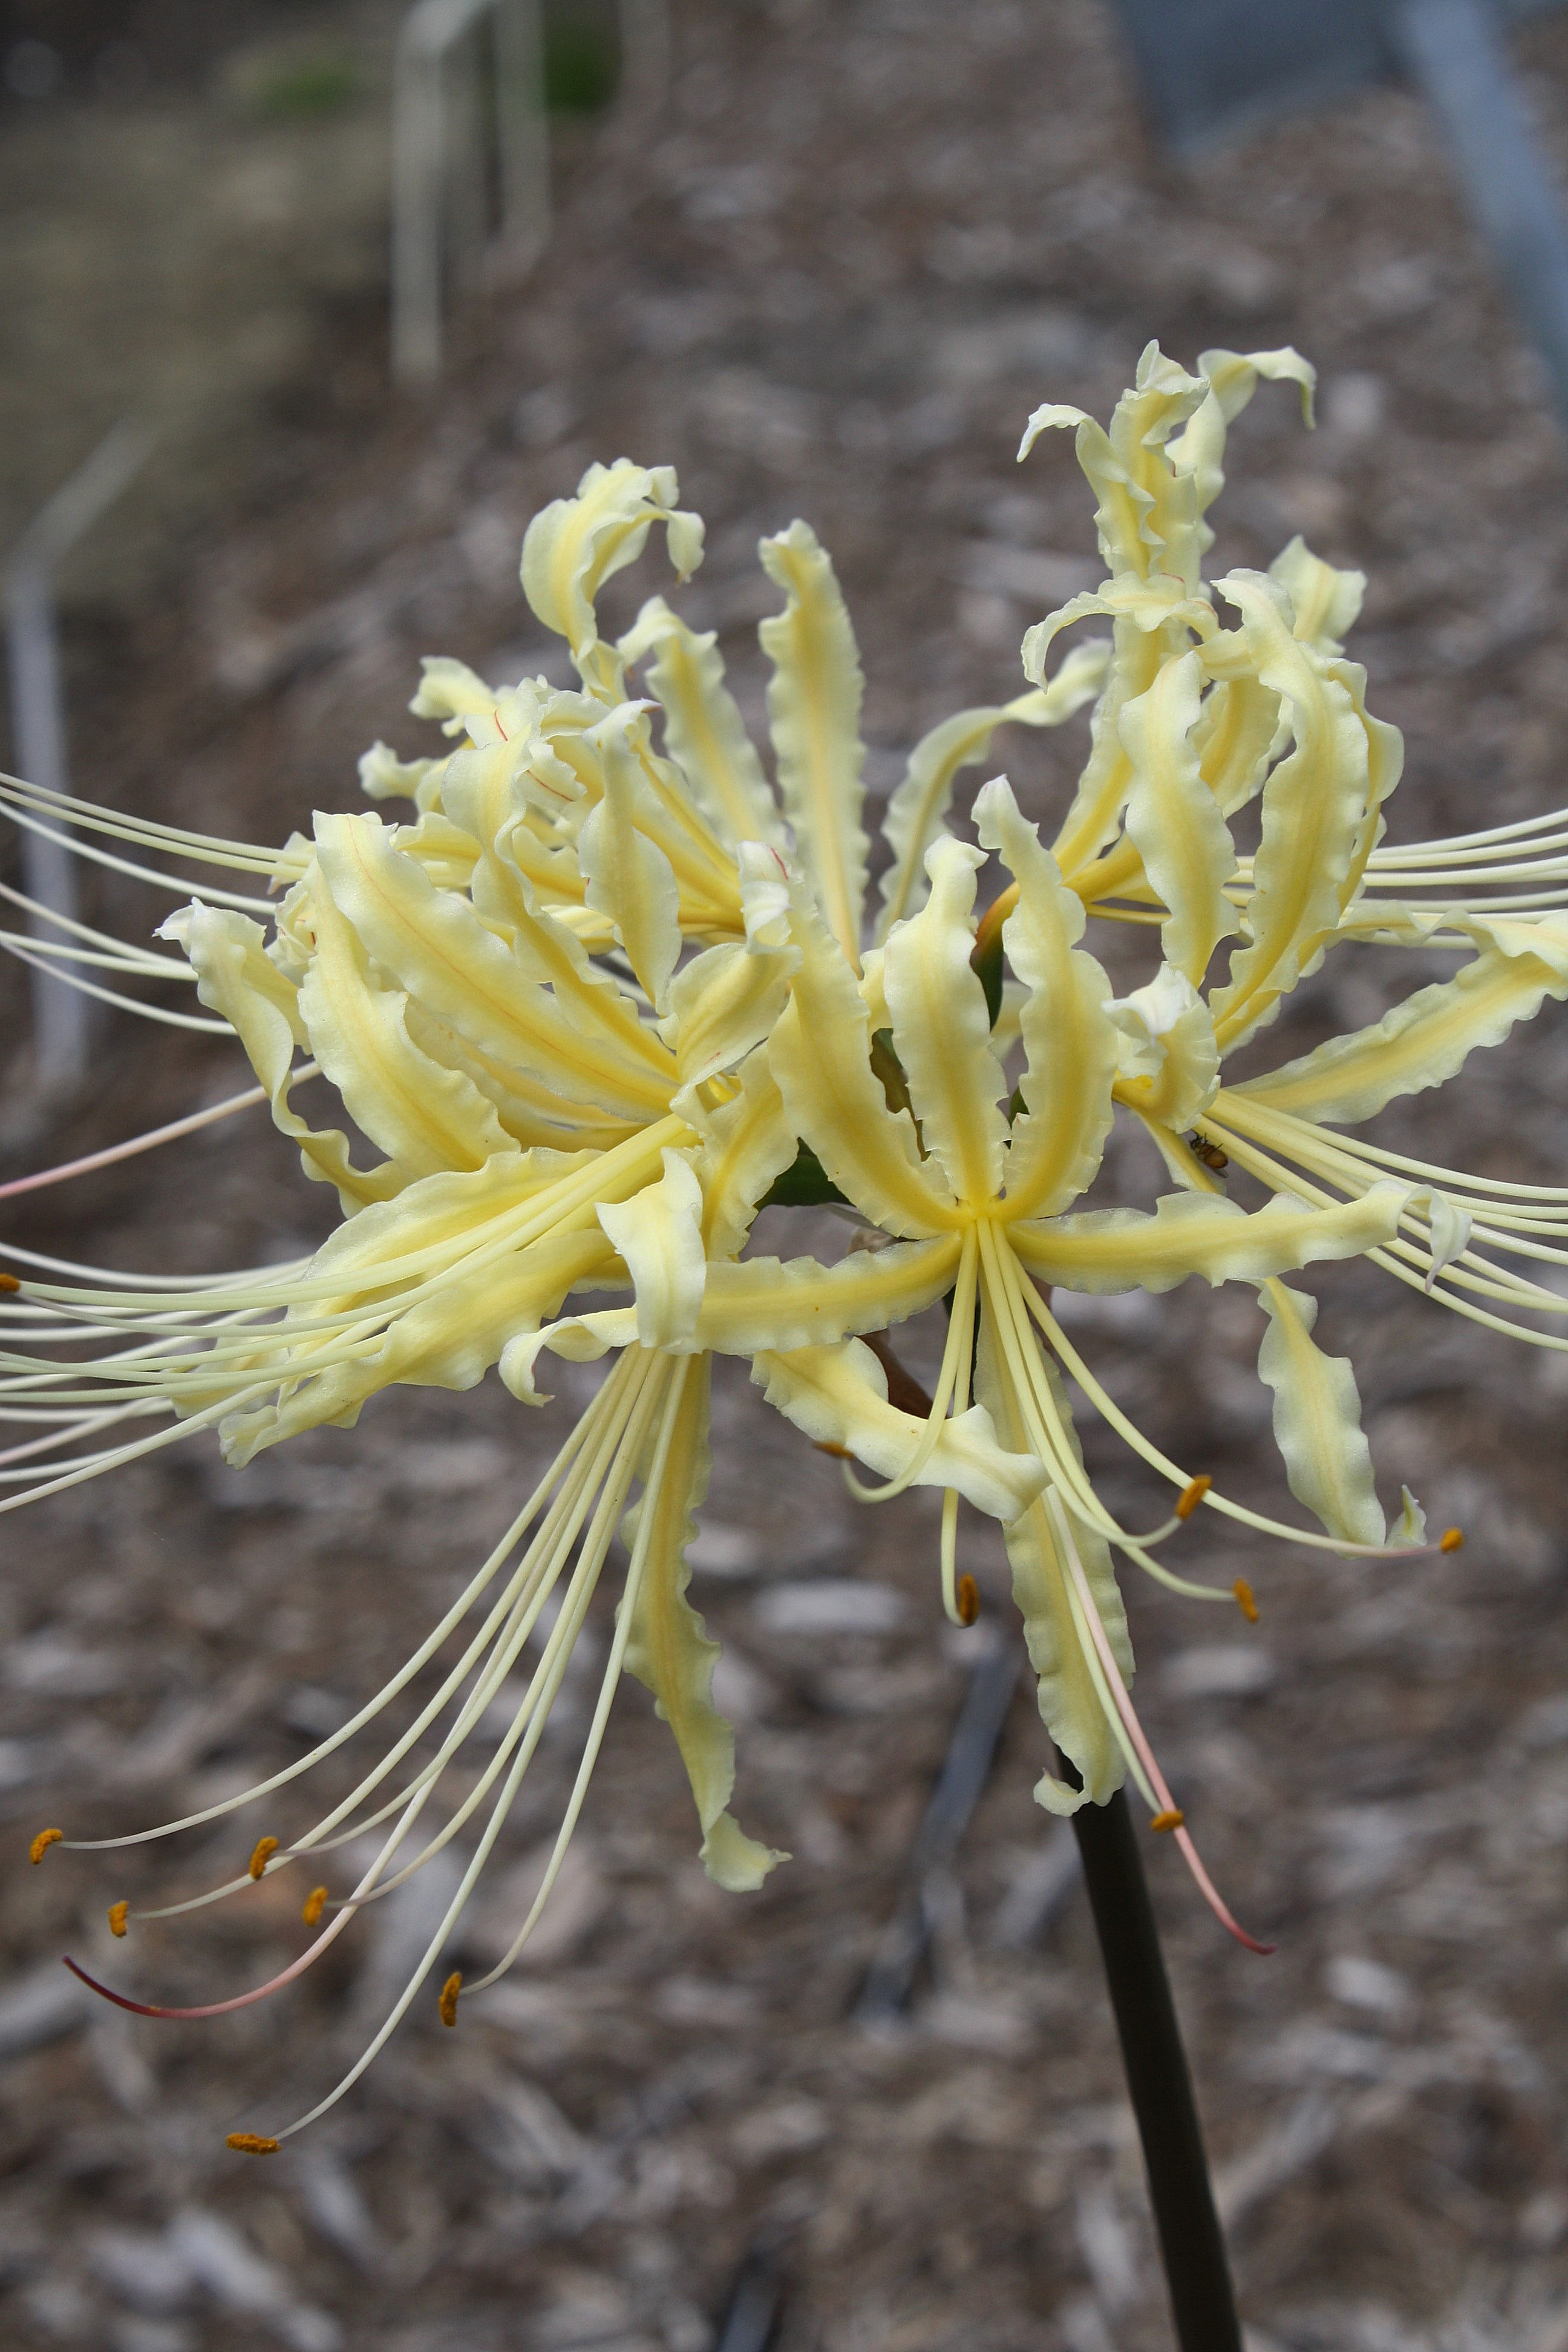 Lycoris x straminea 'Yellow Streamers' @ JLBG - a PDN/JLBG selection of a hybrid of Lycoris radiata var. pumila x chinensis from a Chinese Nursery bulb import